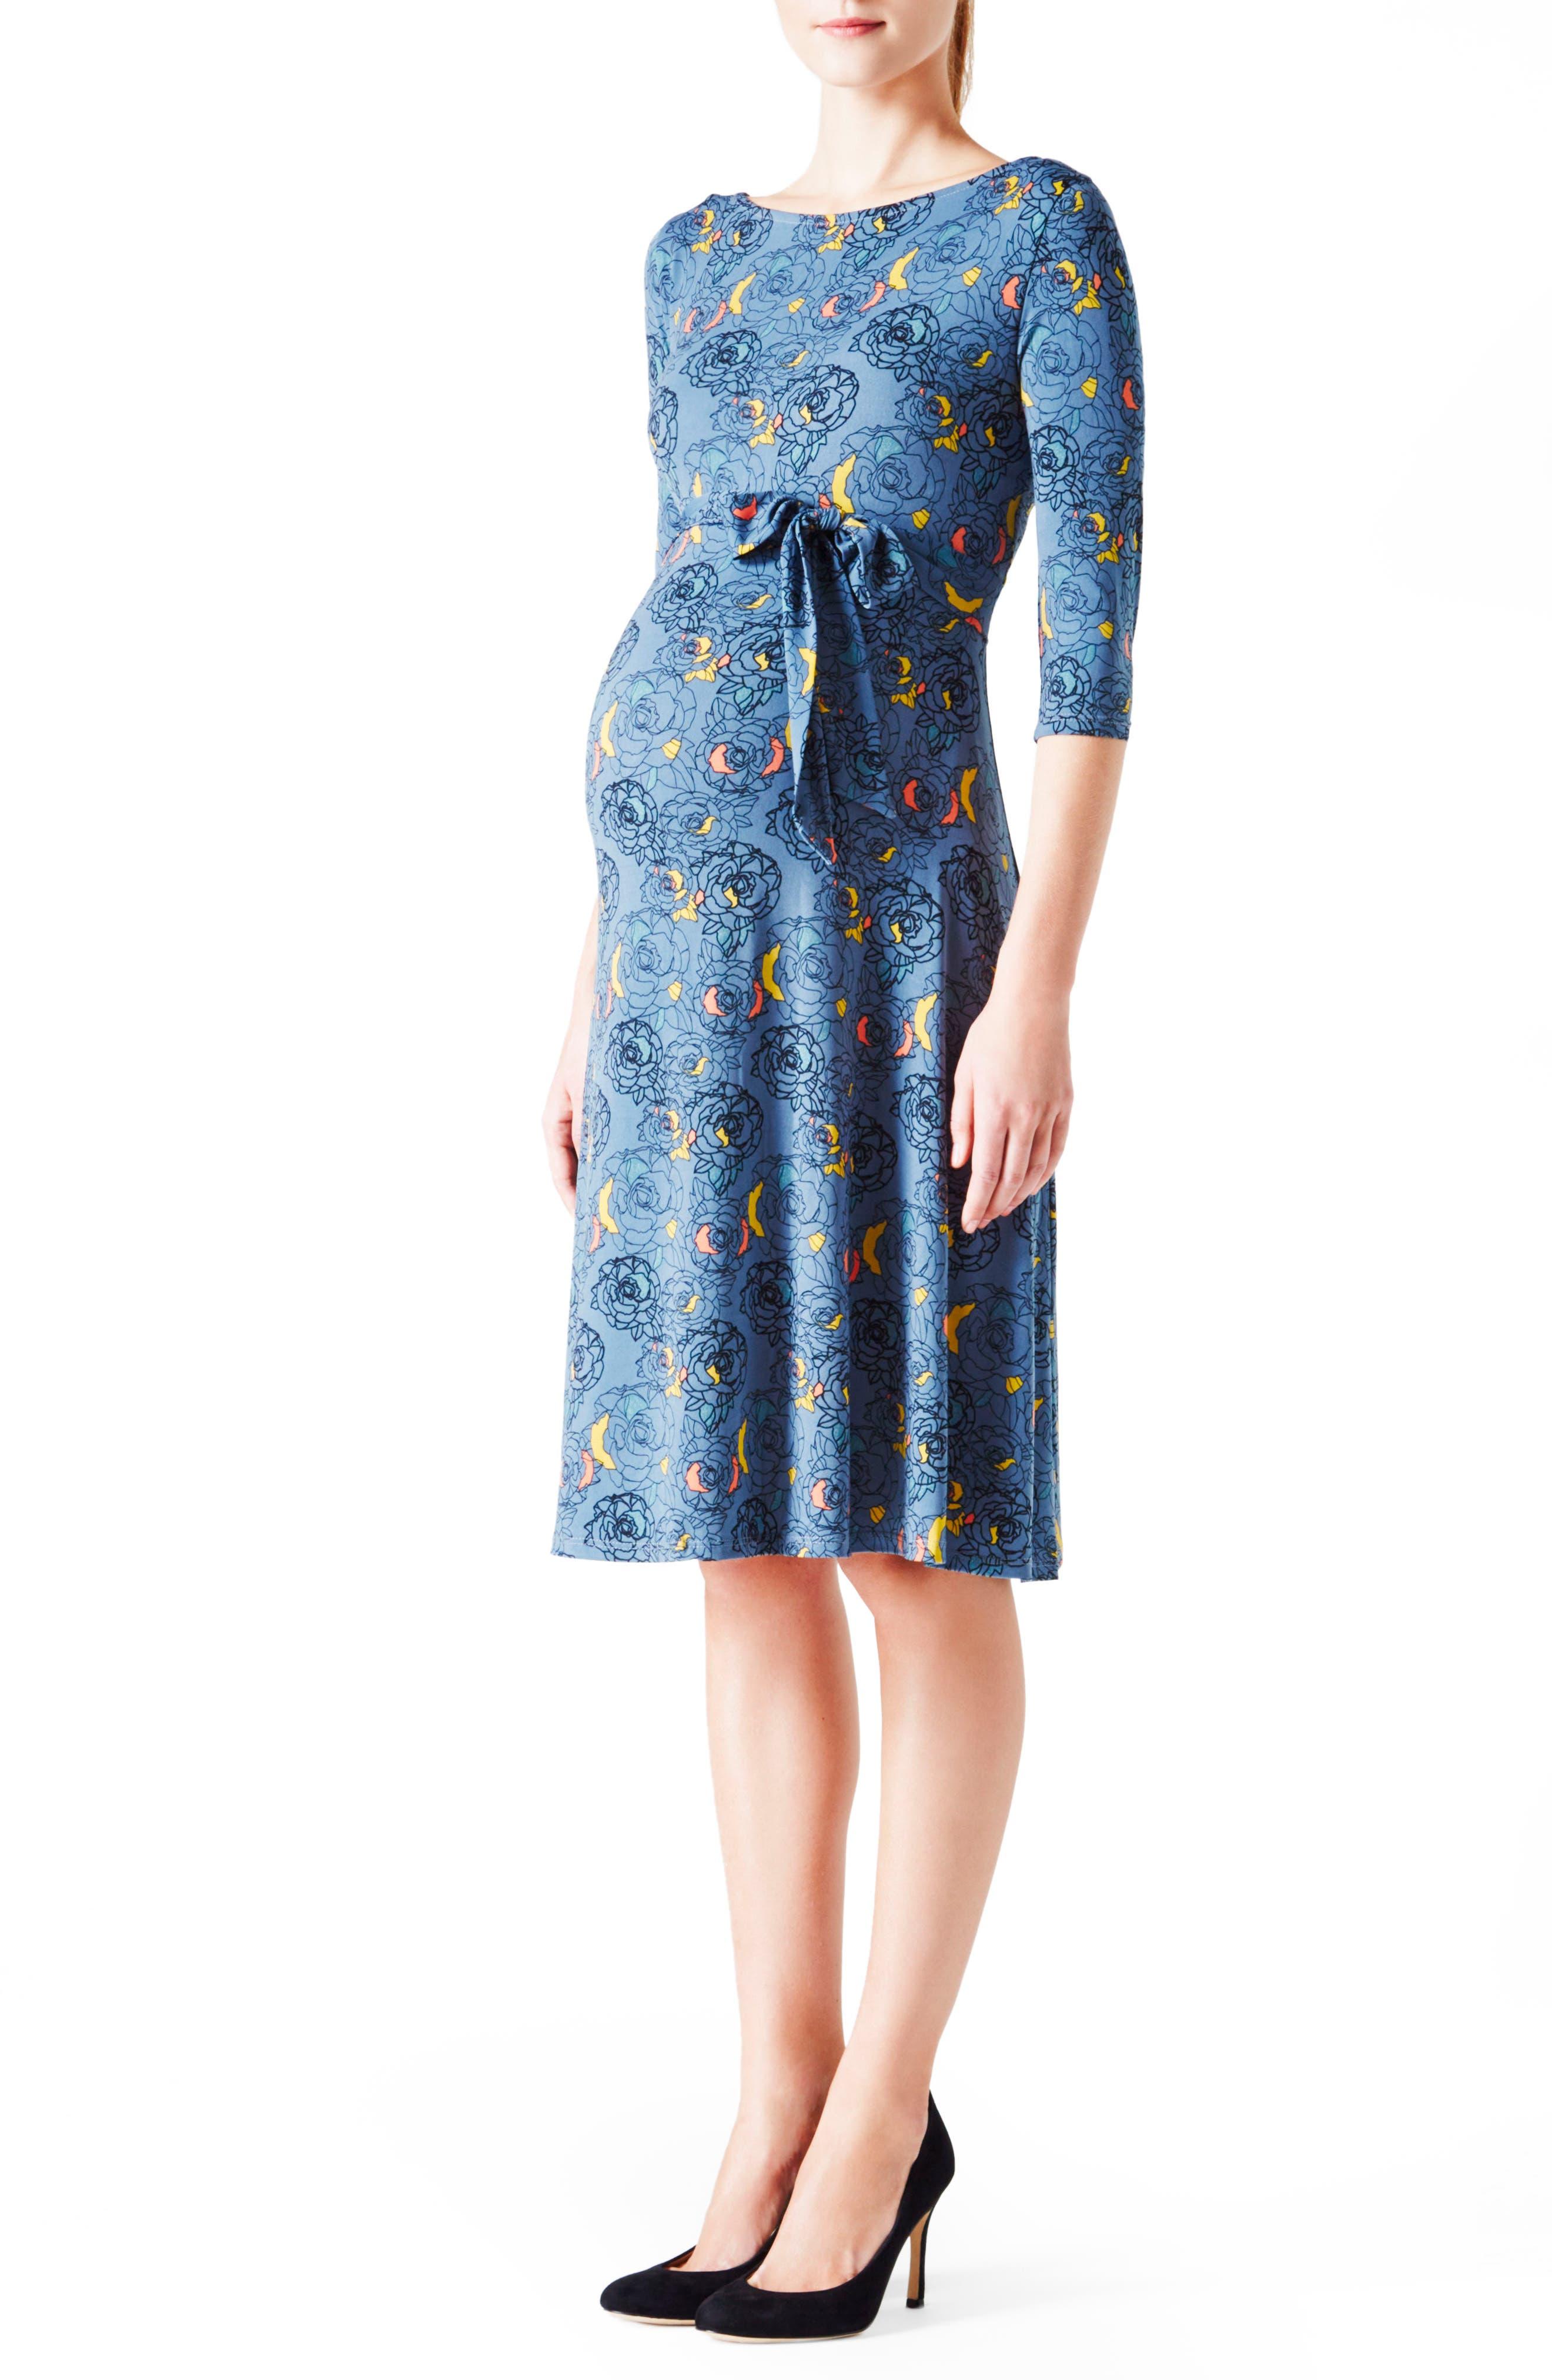 Alternate Image 1 Selected - Leota 'Ilana' Belted Maternity Dress